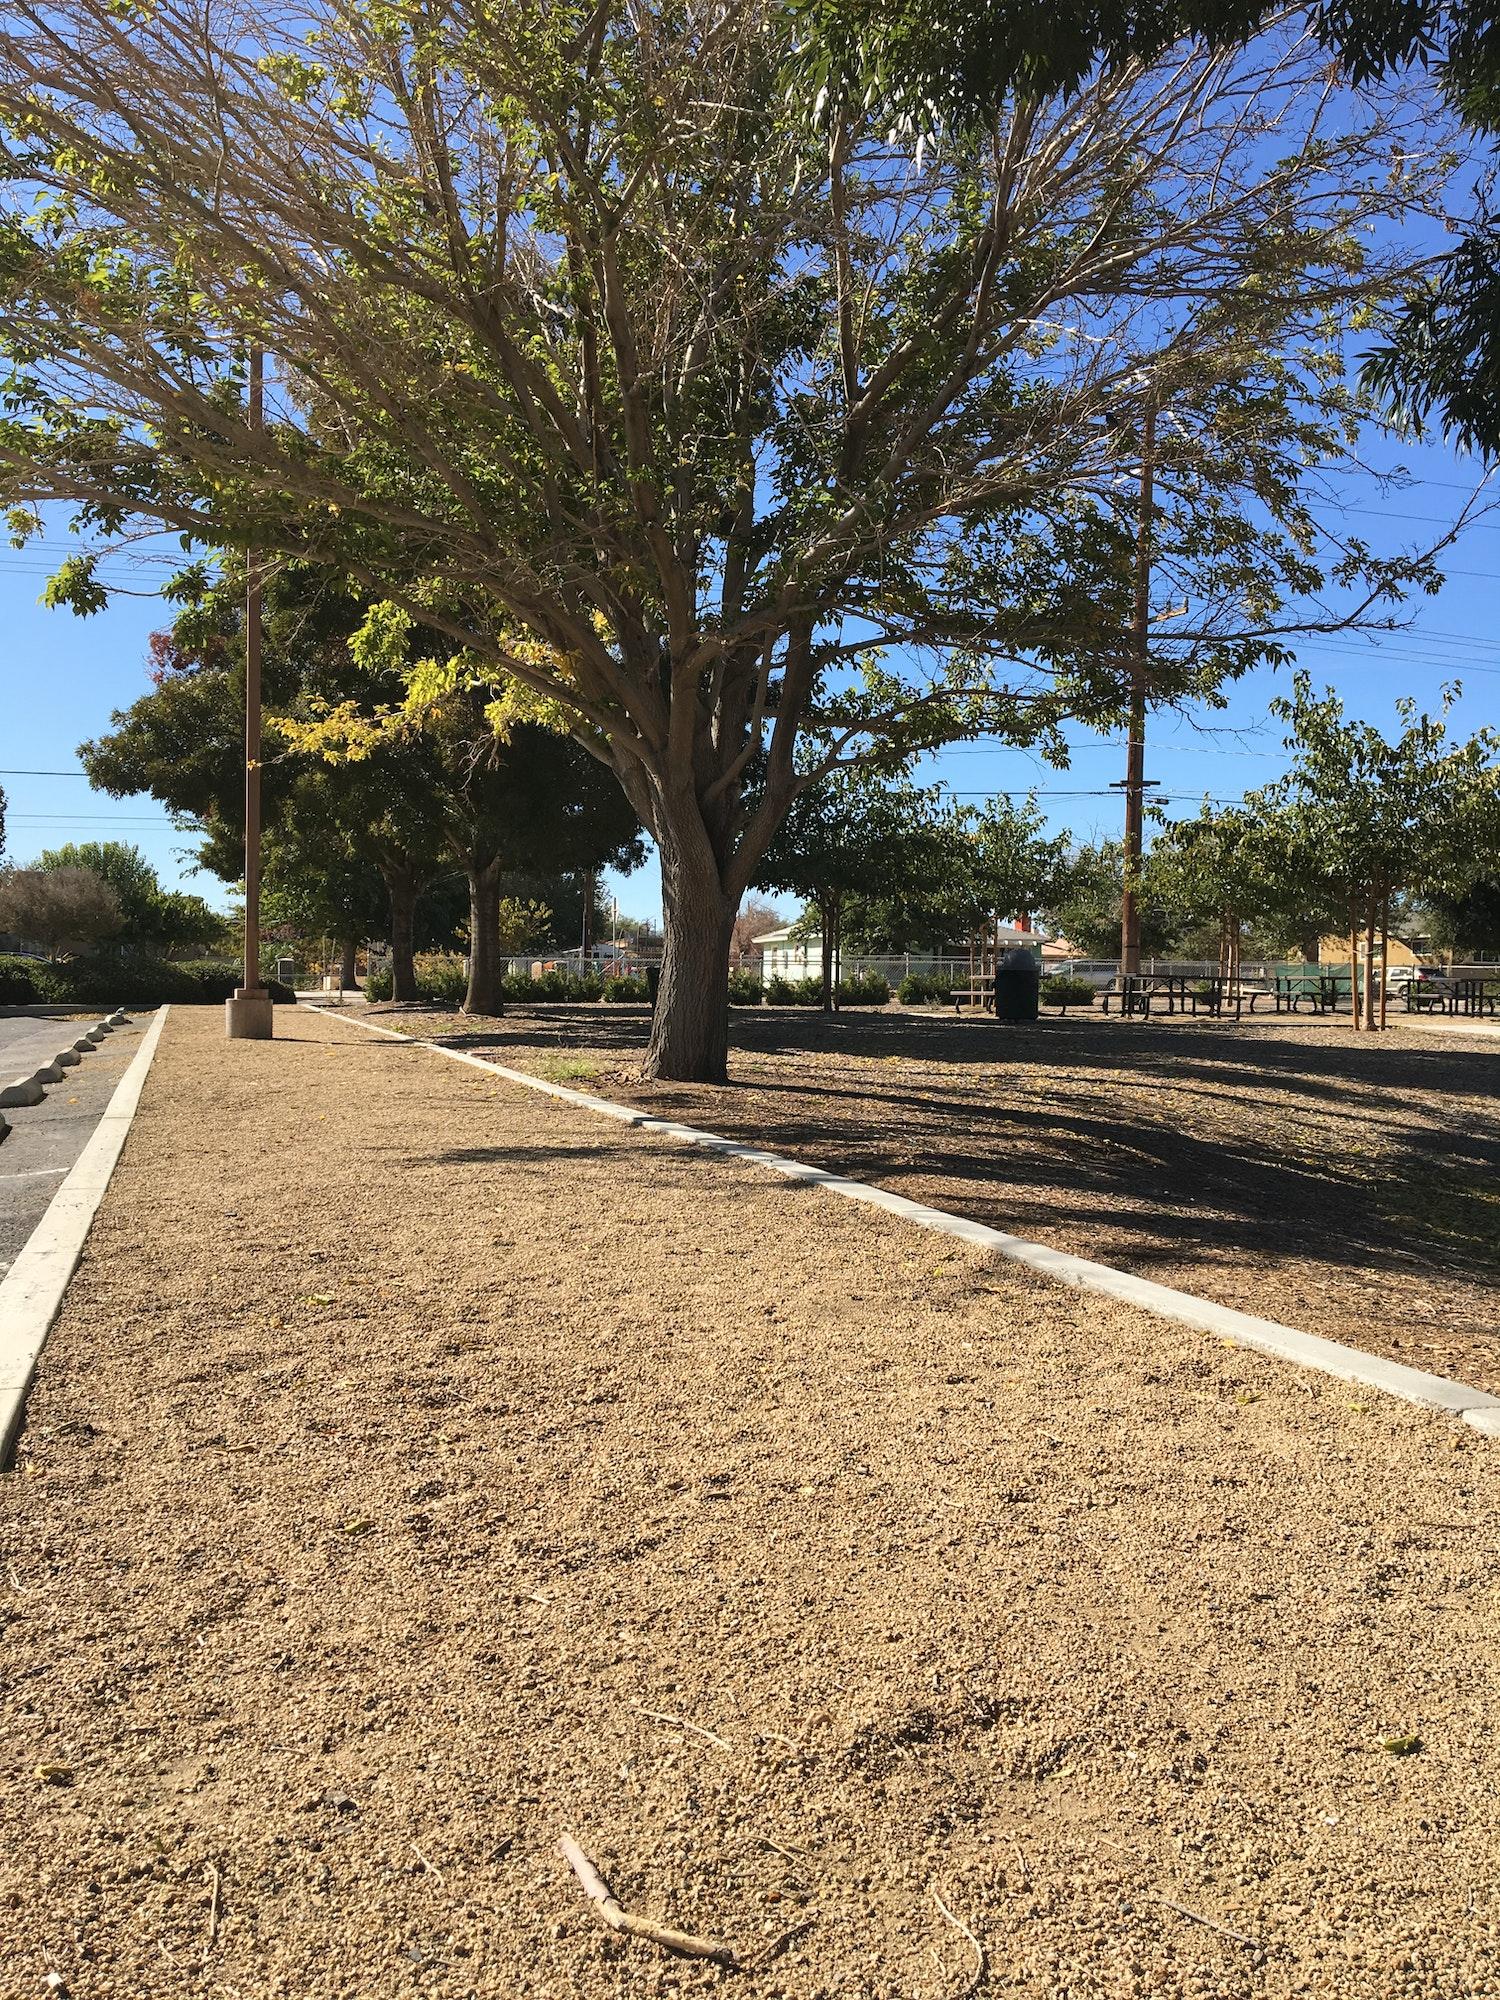 May contain: road, asphalt, tarmac, plant, tree, dirt road, and gravel